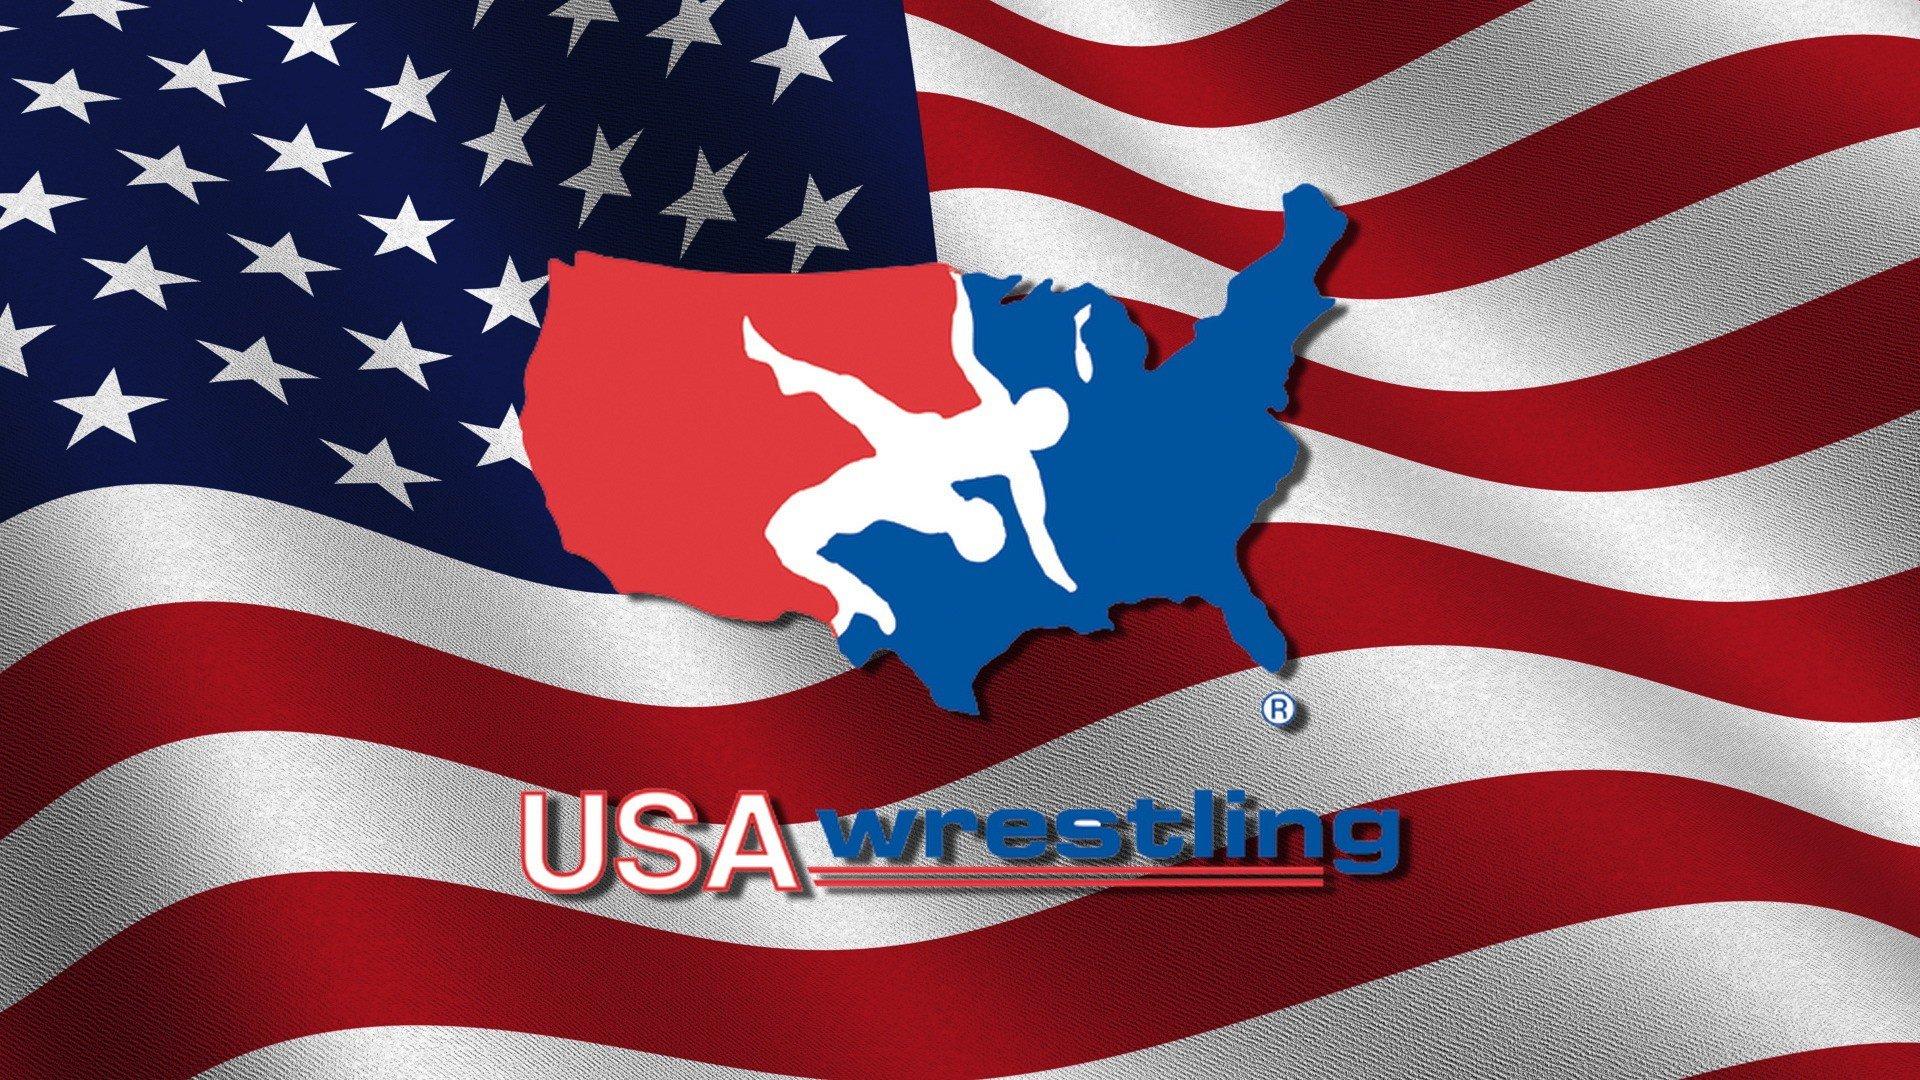 49] USA Wrestling Wallpapers on WallpaperSafari 1920x1080